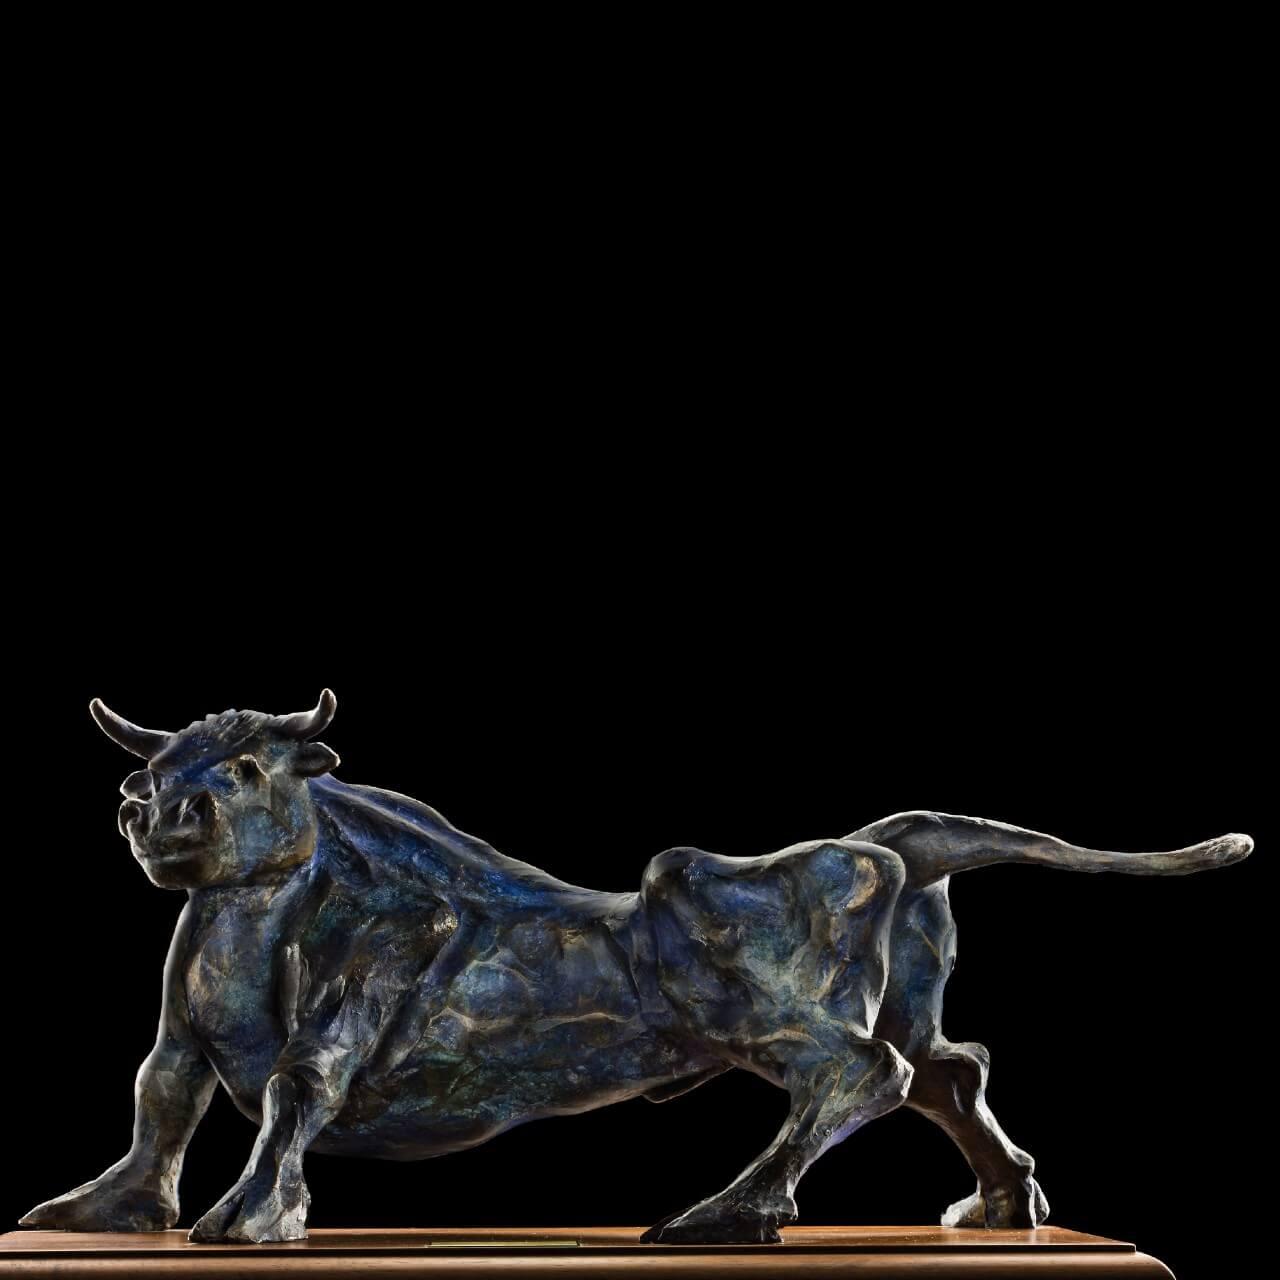 scultura bronzo Mario Pavesi artista reggiano arte animali toro blu